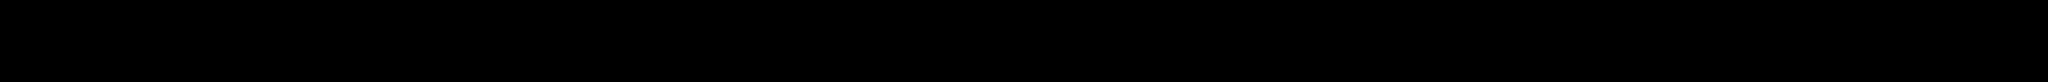 LIQUI MOLY P000562 Handreiniger